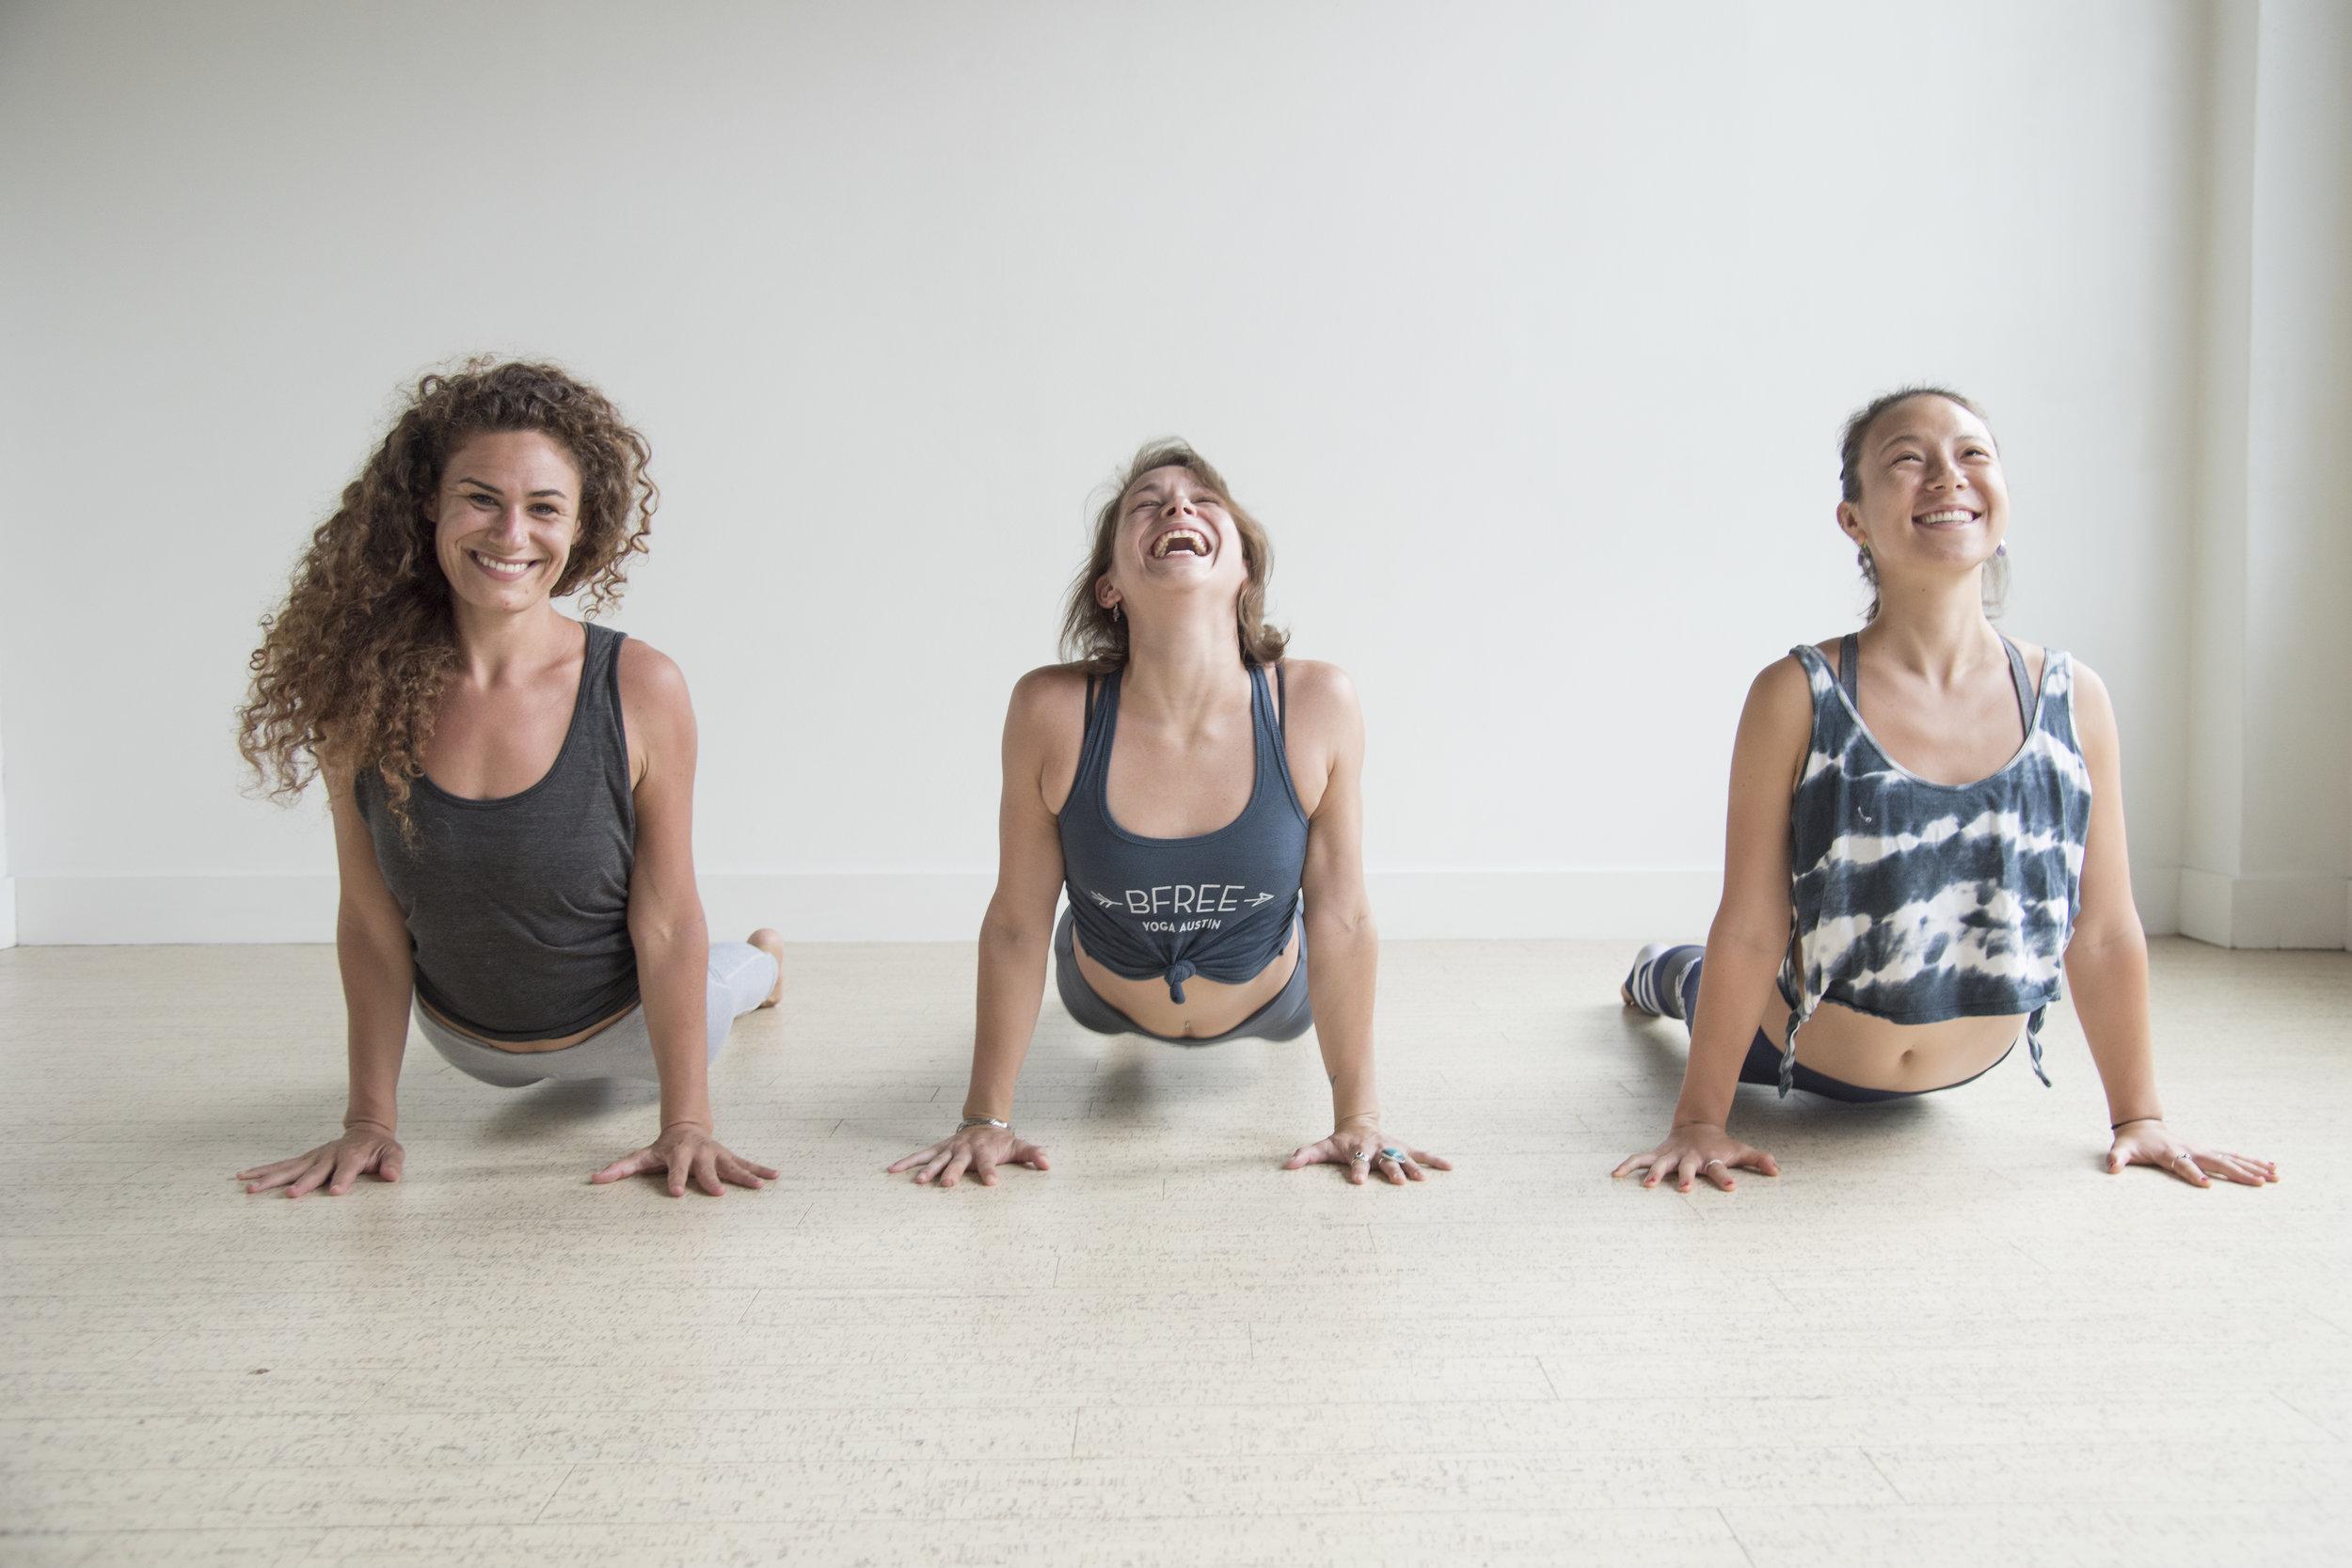 BFree Yoga Upward Brand Photo